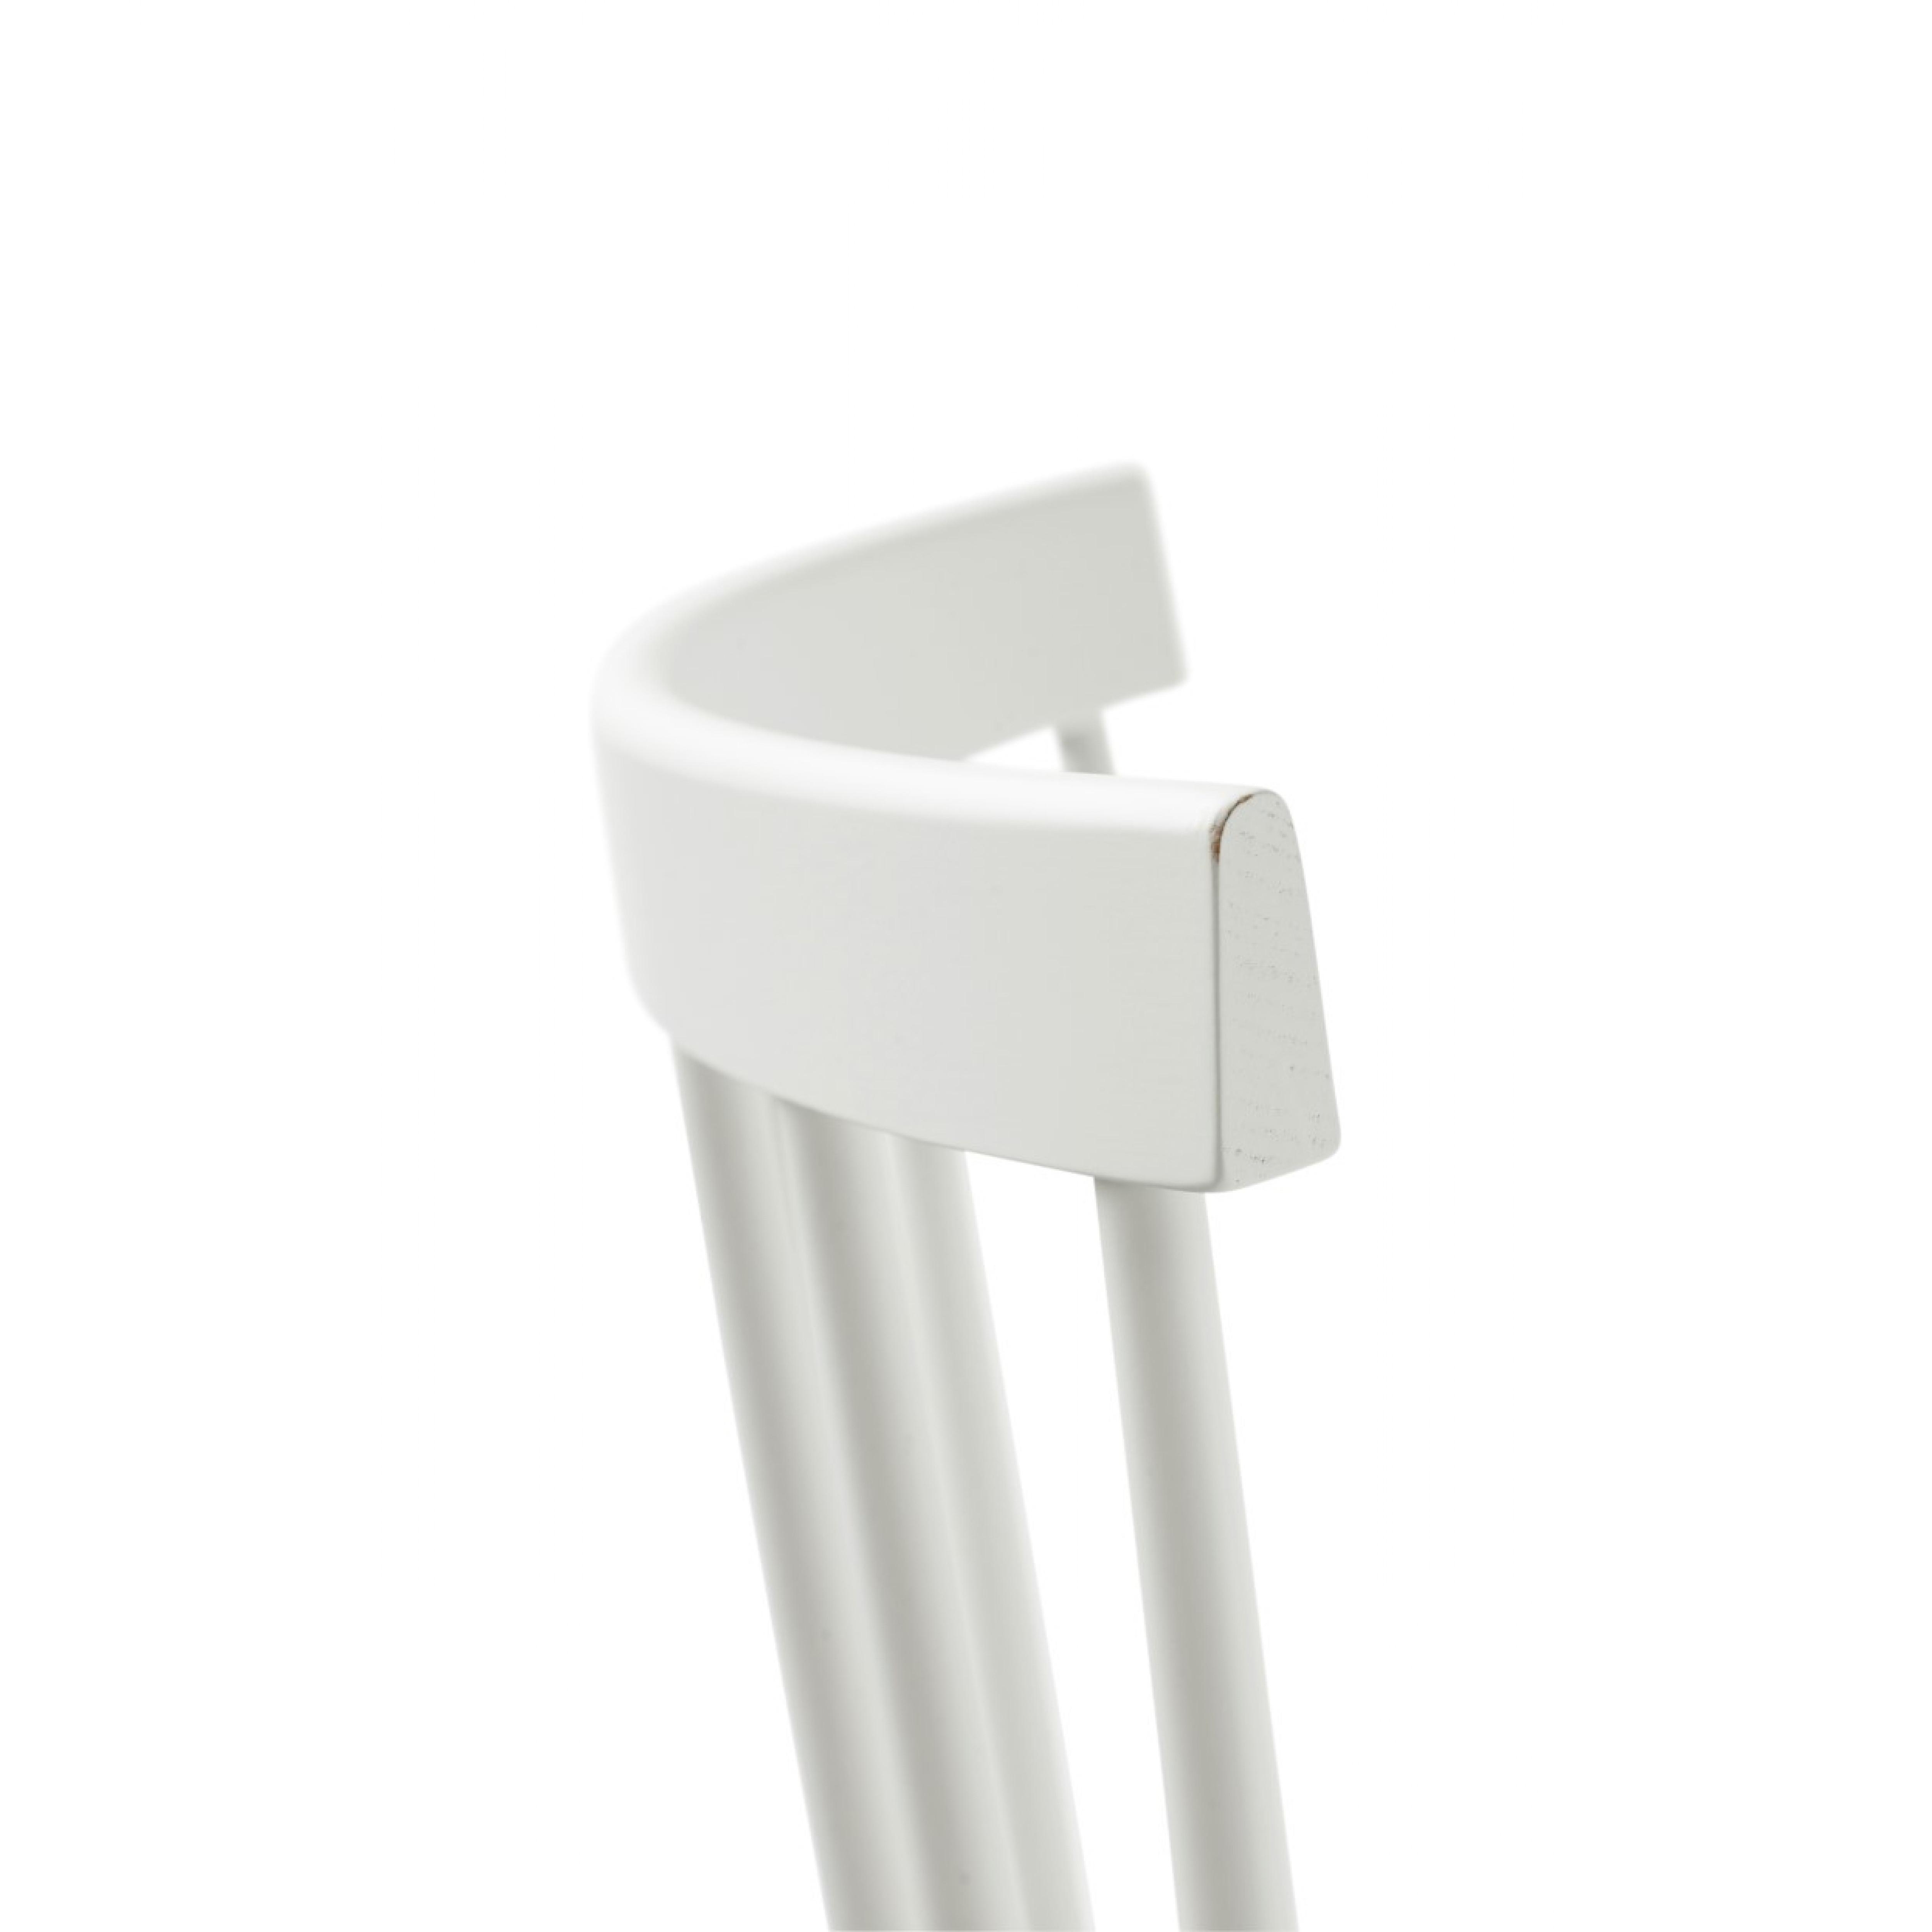 Stuhl J46   Weiß